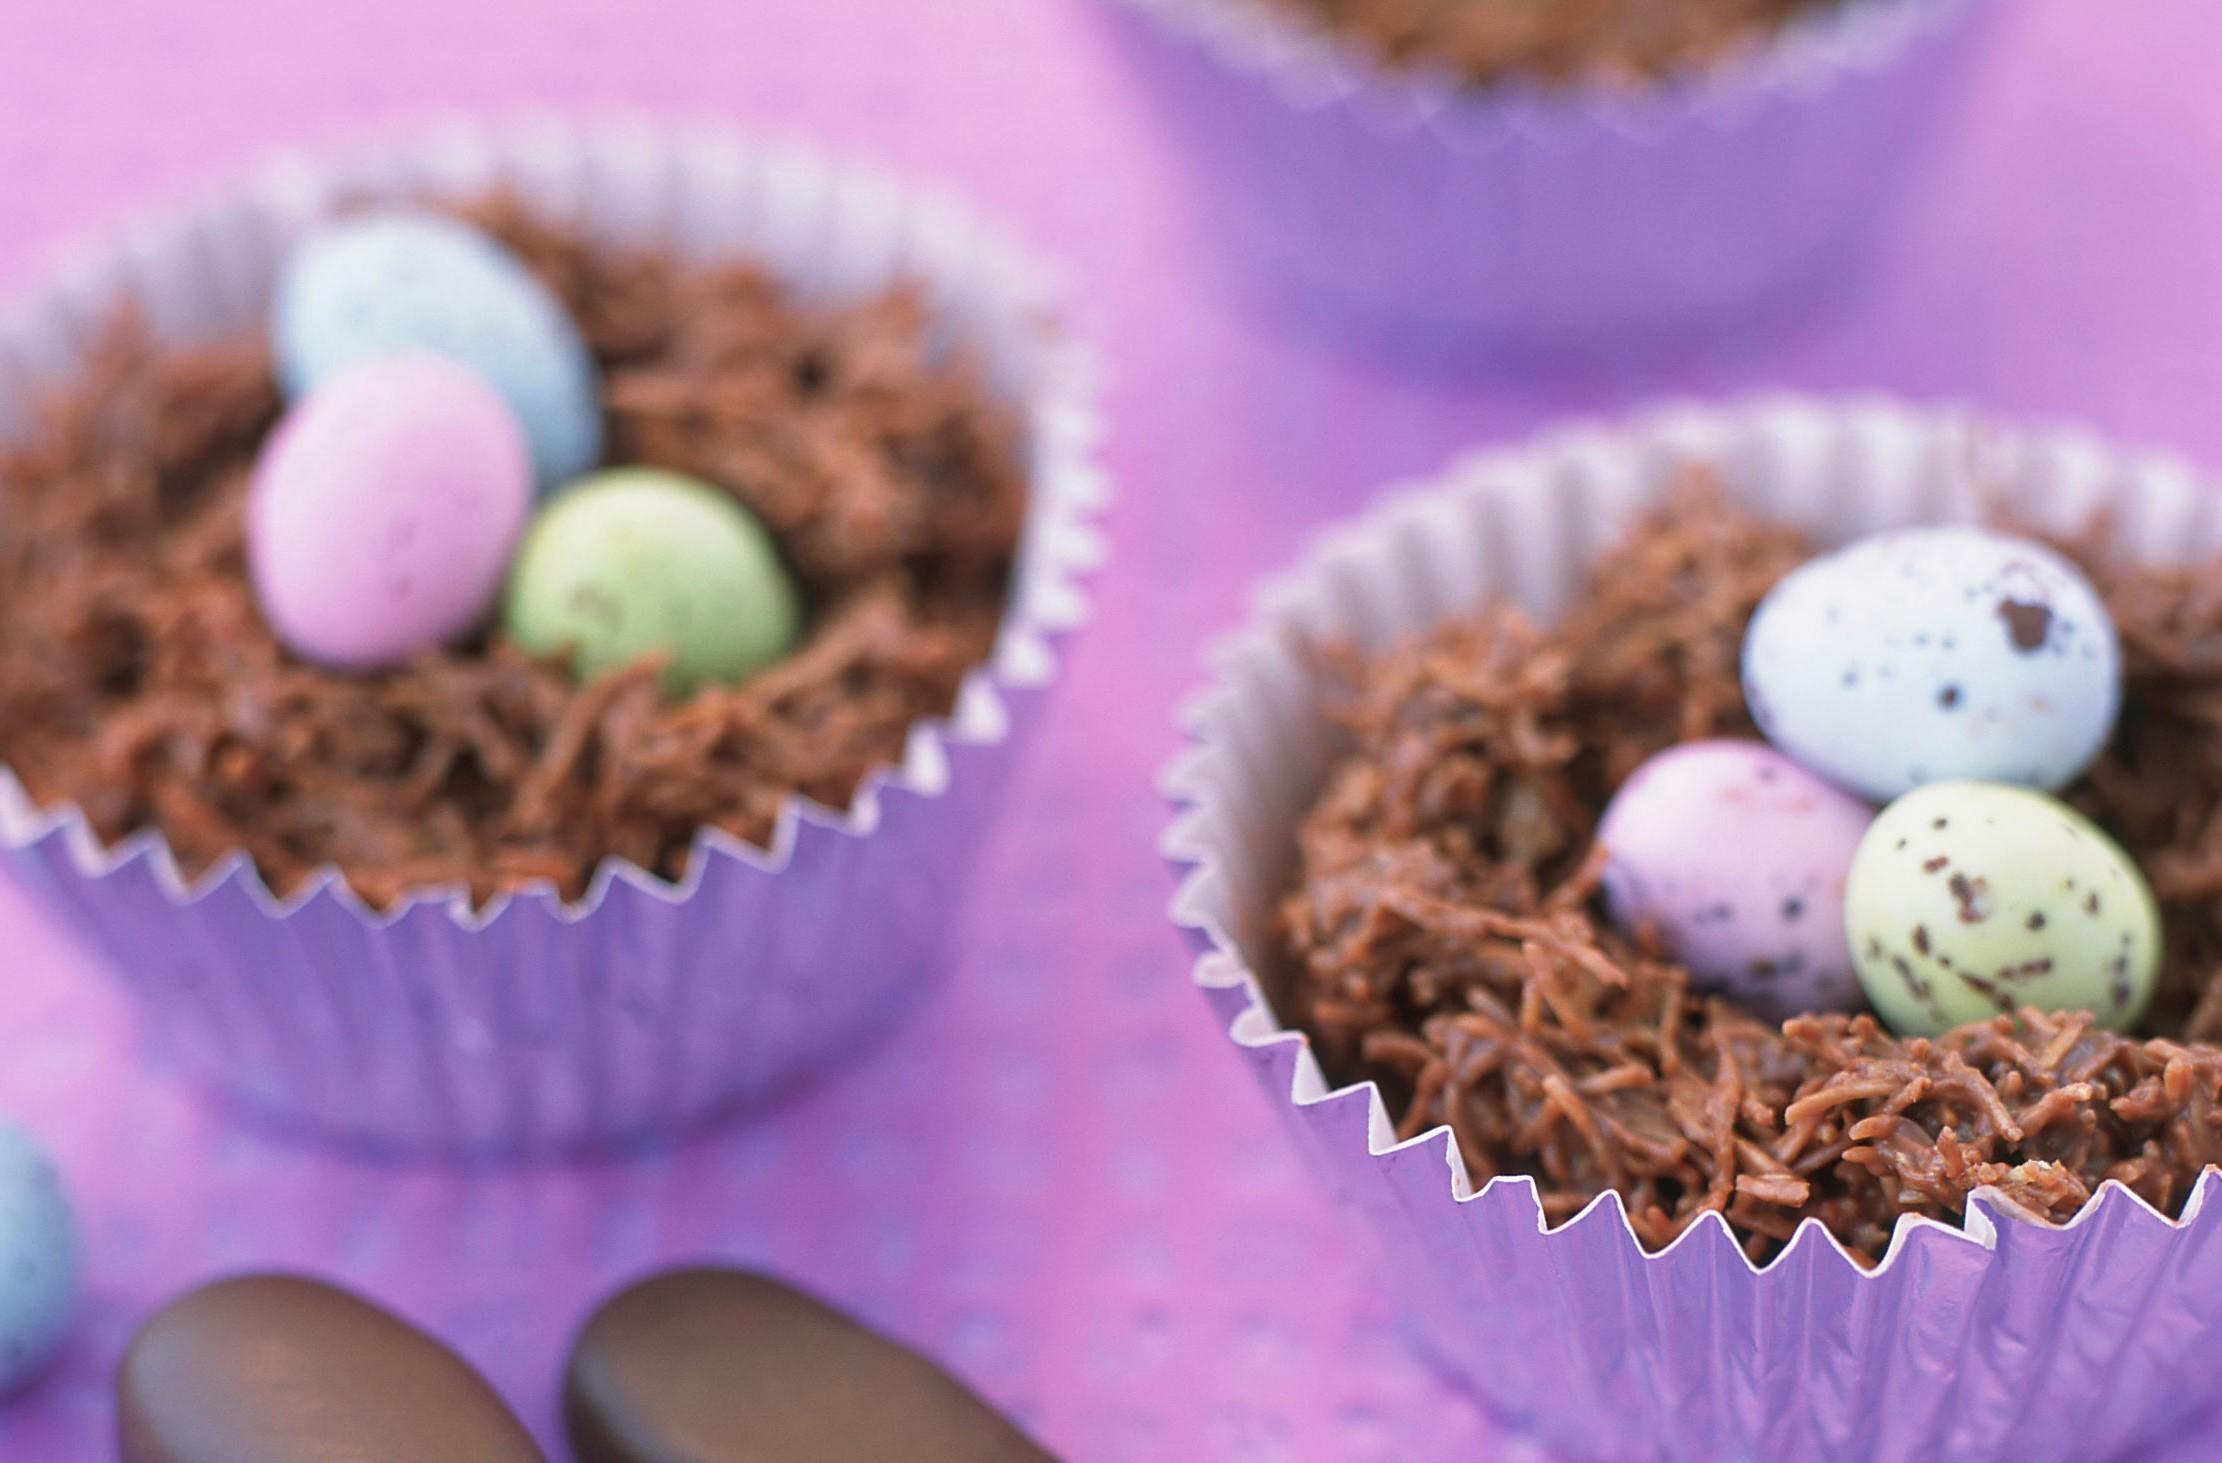 Délicieux cupcakes au chocolat.